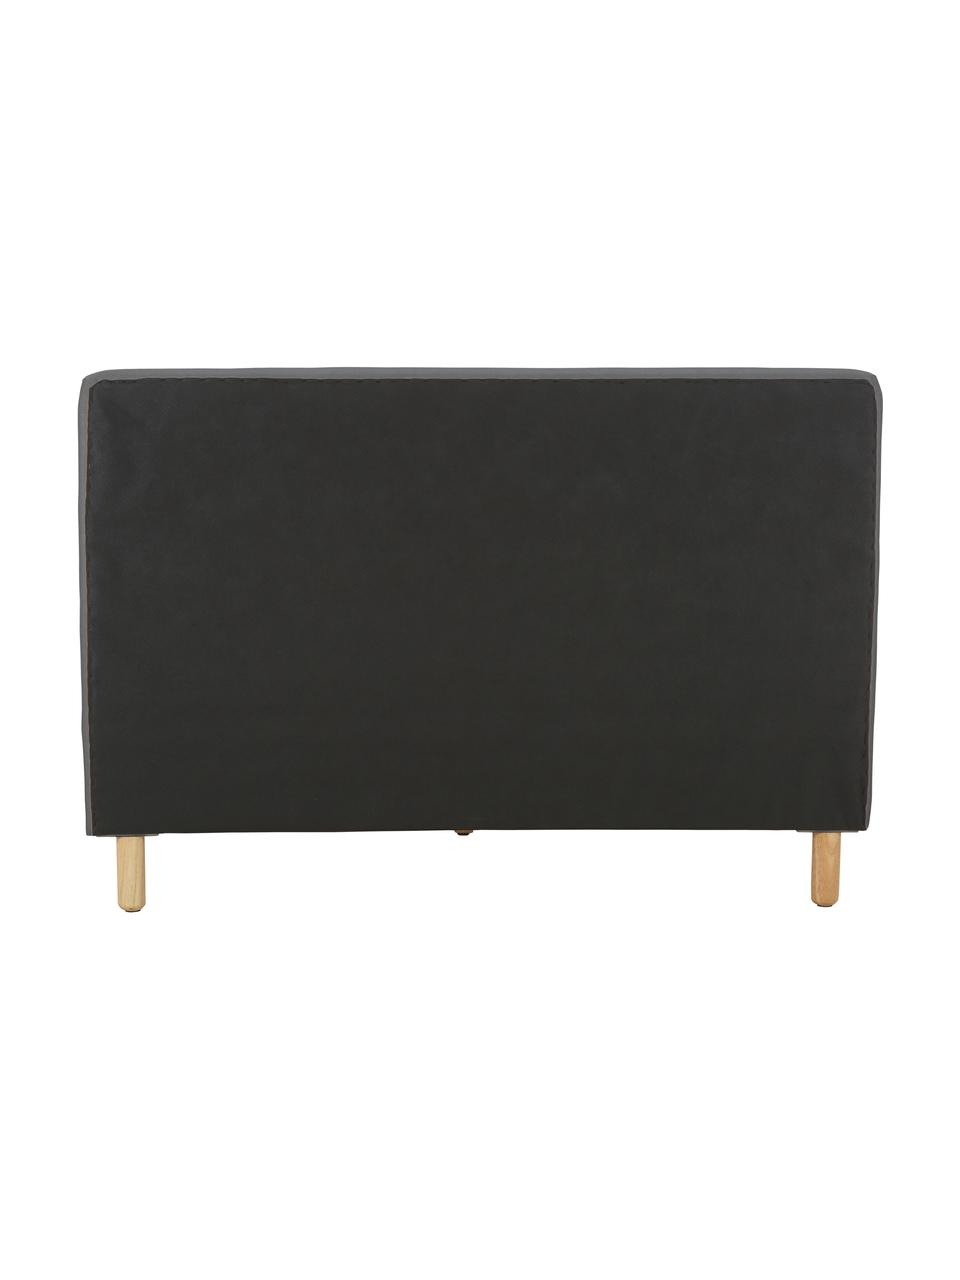 Gestoffeerd bed Celeste, Frame: massief grenenhout, multi, Bekleding: polyester (gestructureerd, Poten: massief rubberhout, gelak, Stof grijs, 180 x 200 cm